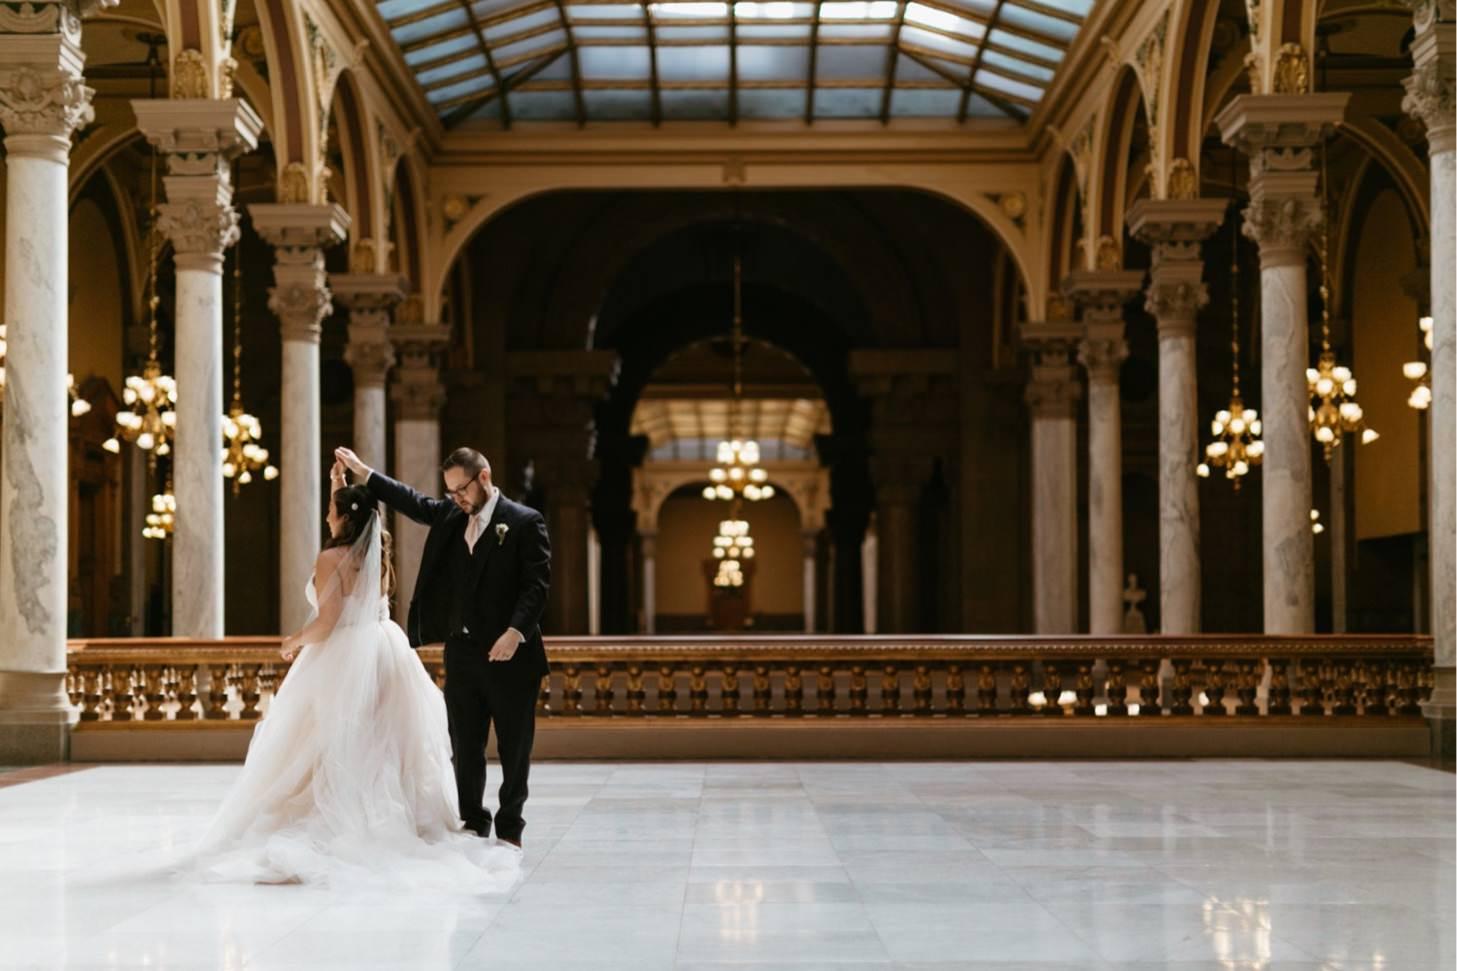 indiana-state-house-wedding-downtown-indianapolis-wedding-photographer076.JPG